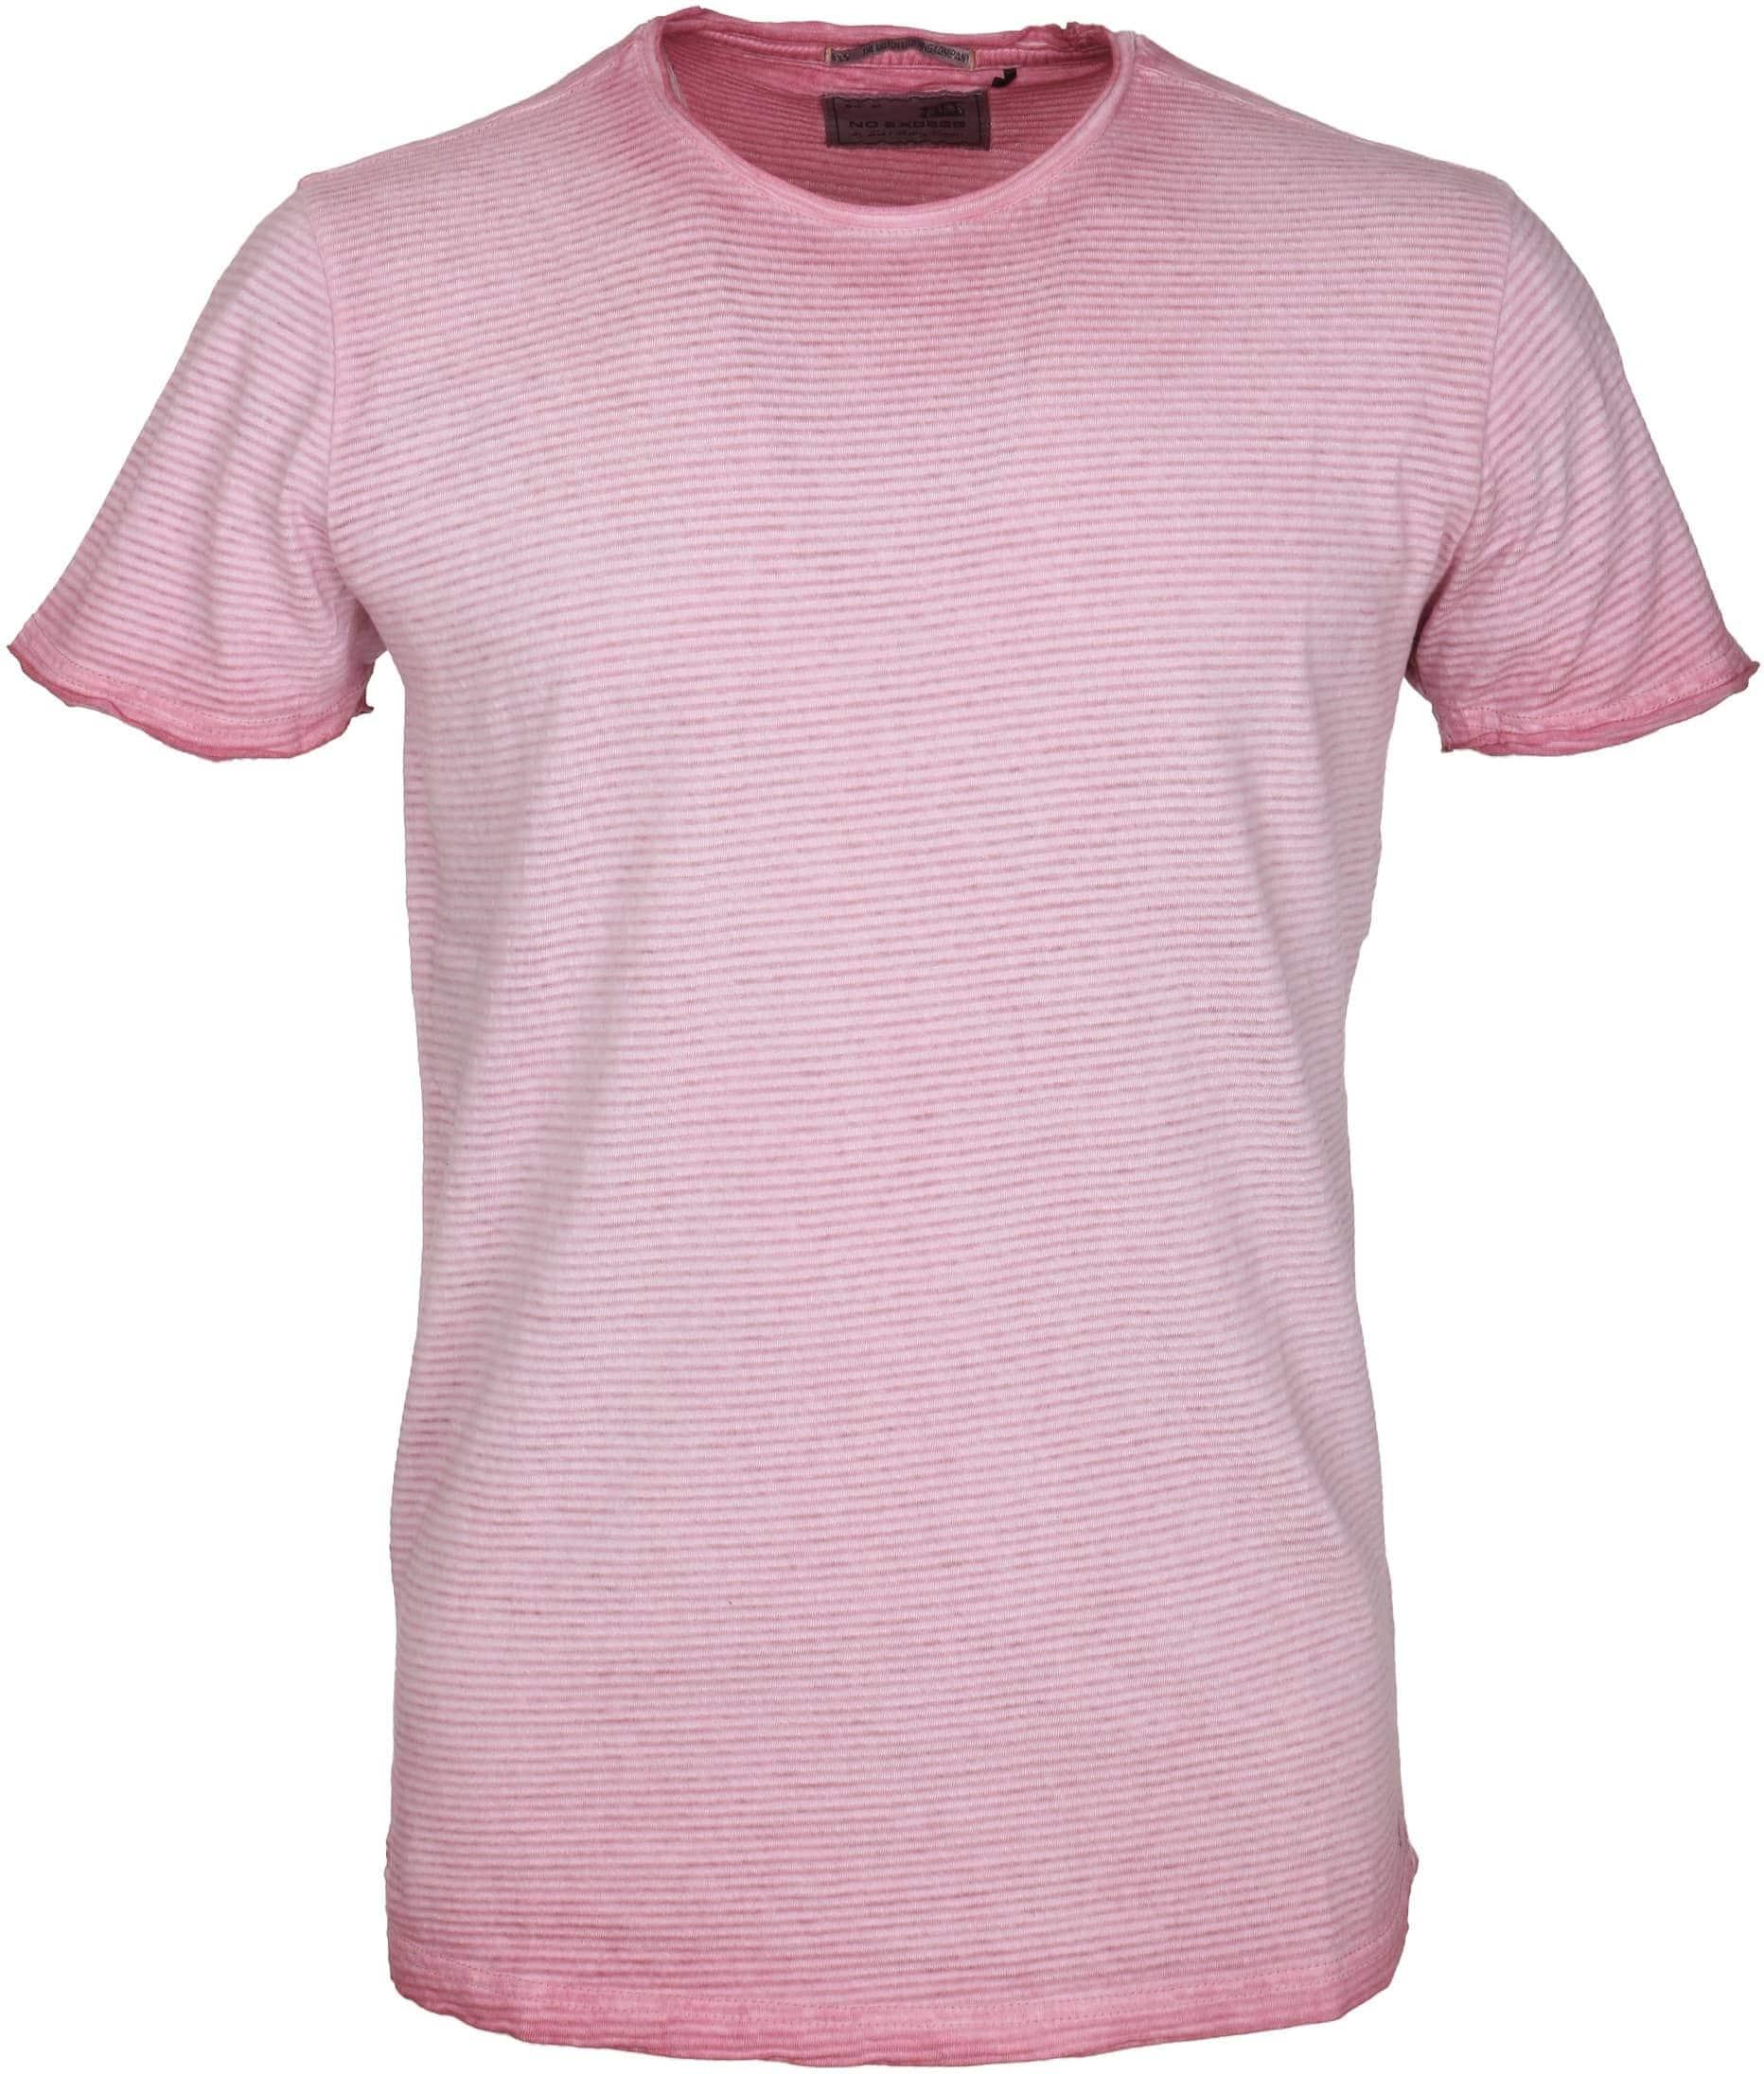 No-Excess T-shirt Rosa Streifen foto 0